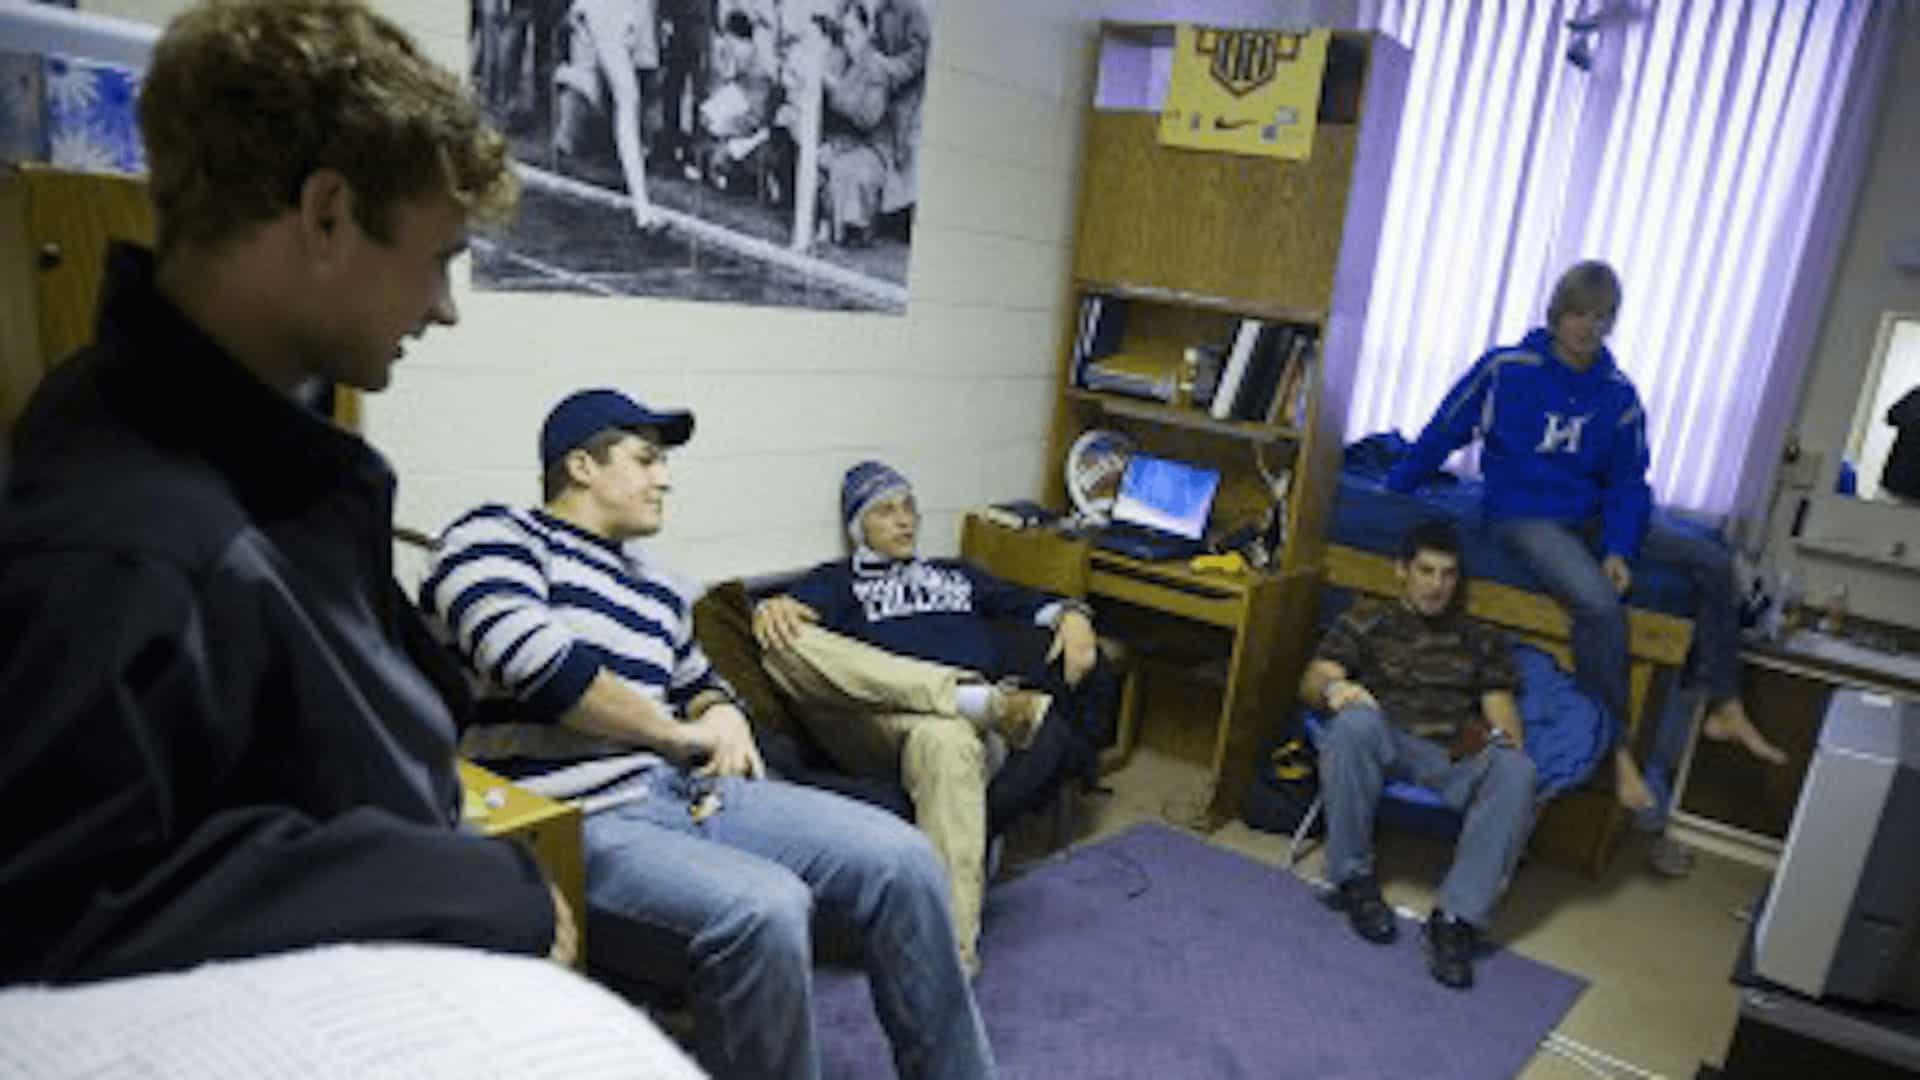 Simpson Dorm room